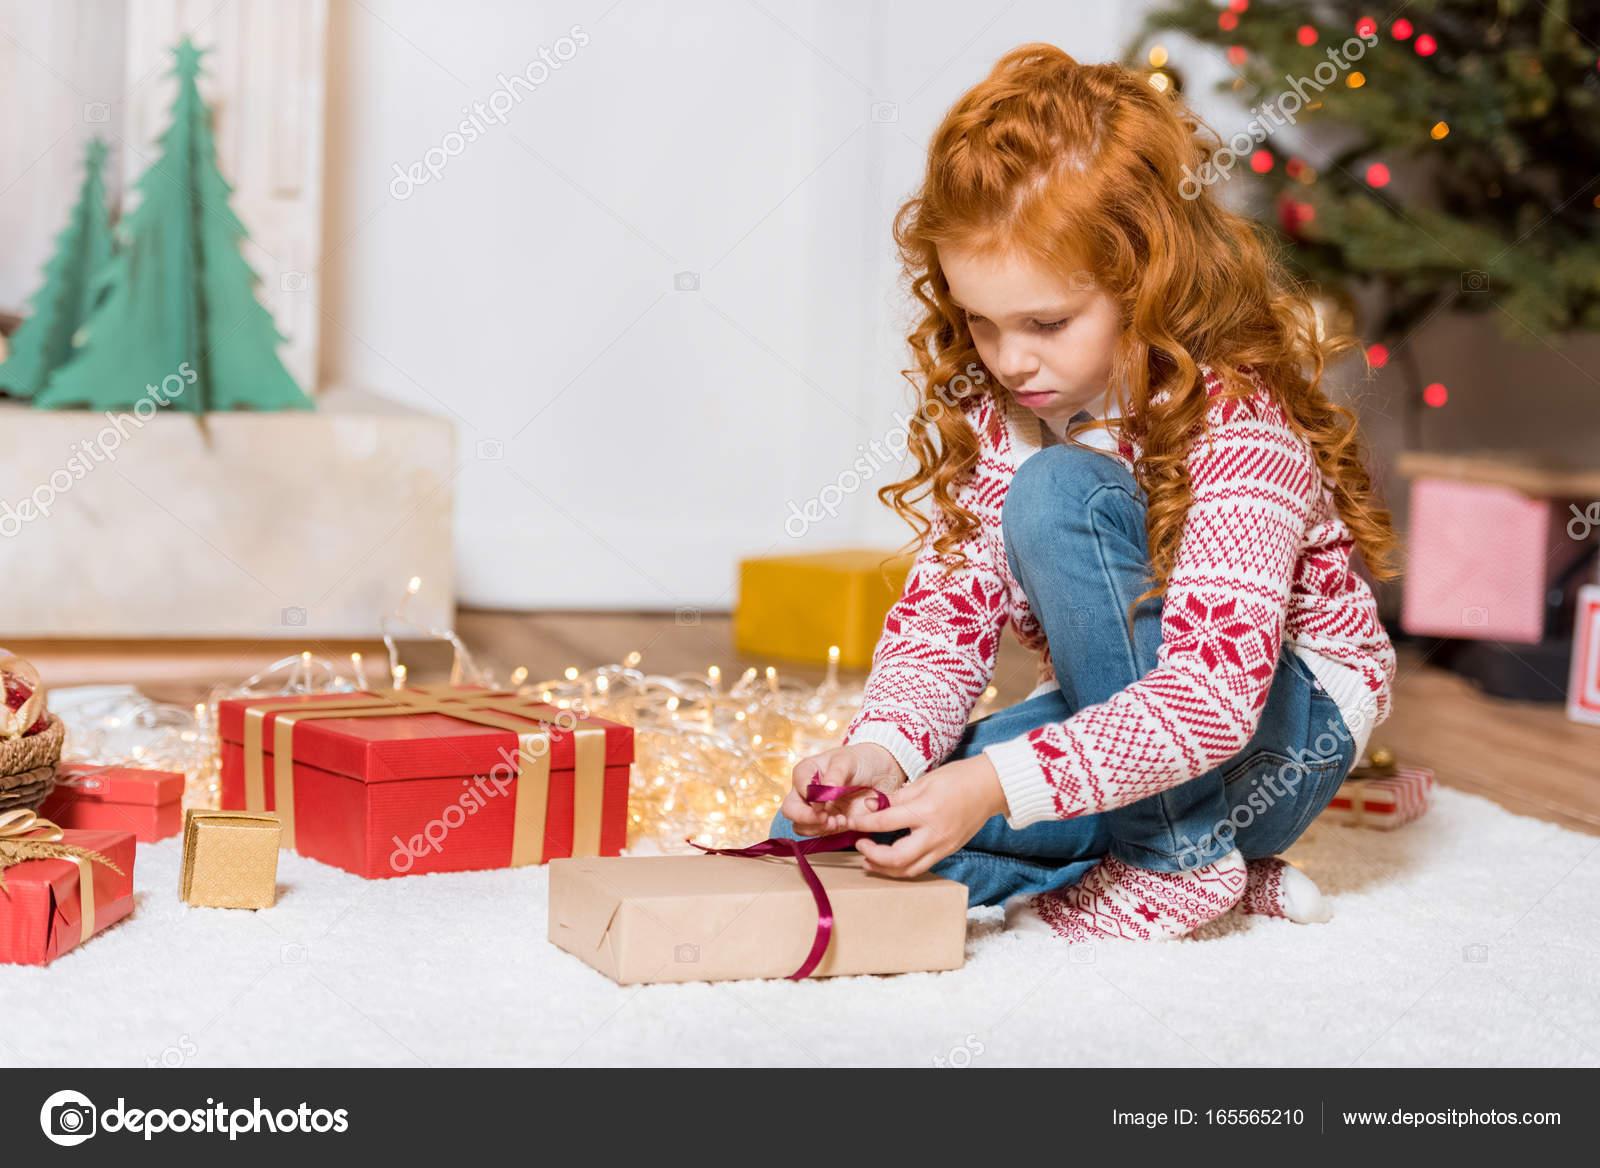 Kind uitpakken kerstcadeau u2014 stockfoto © alebloshka #165565210